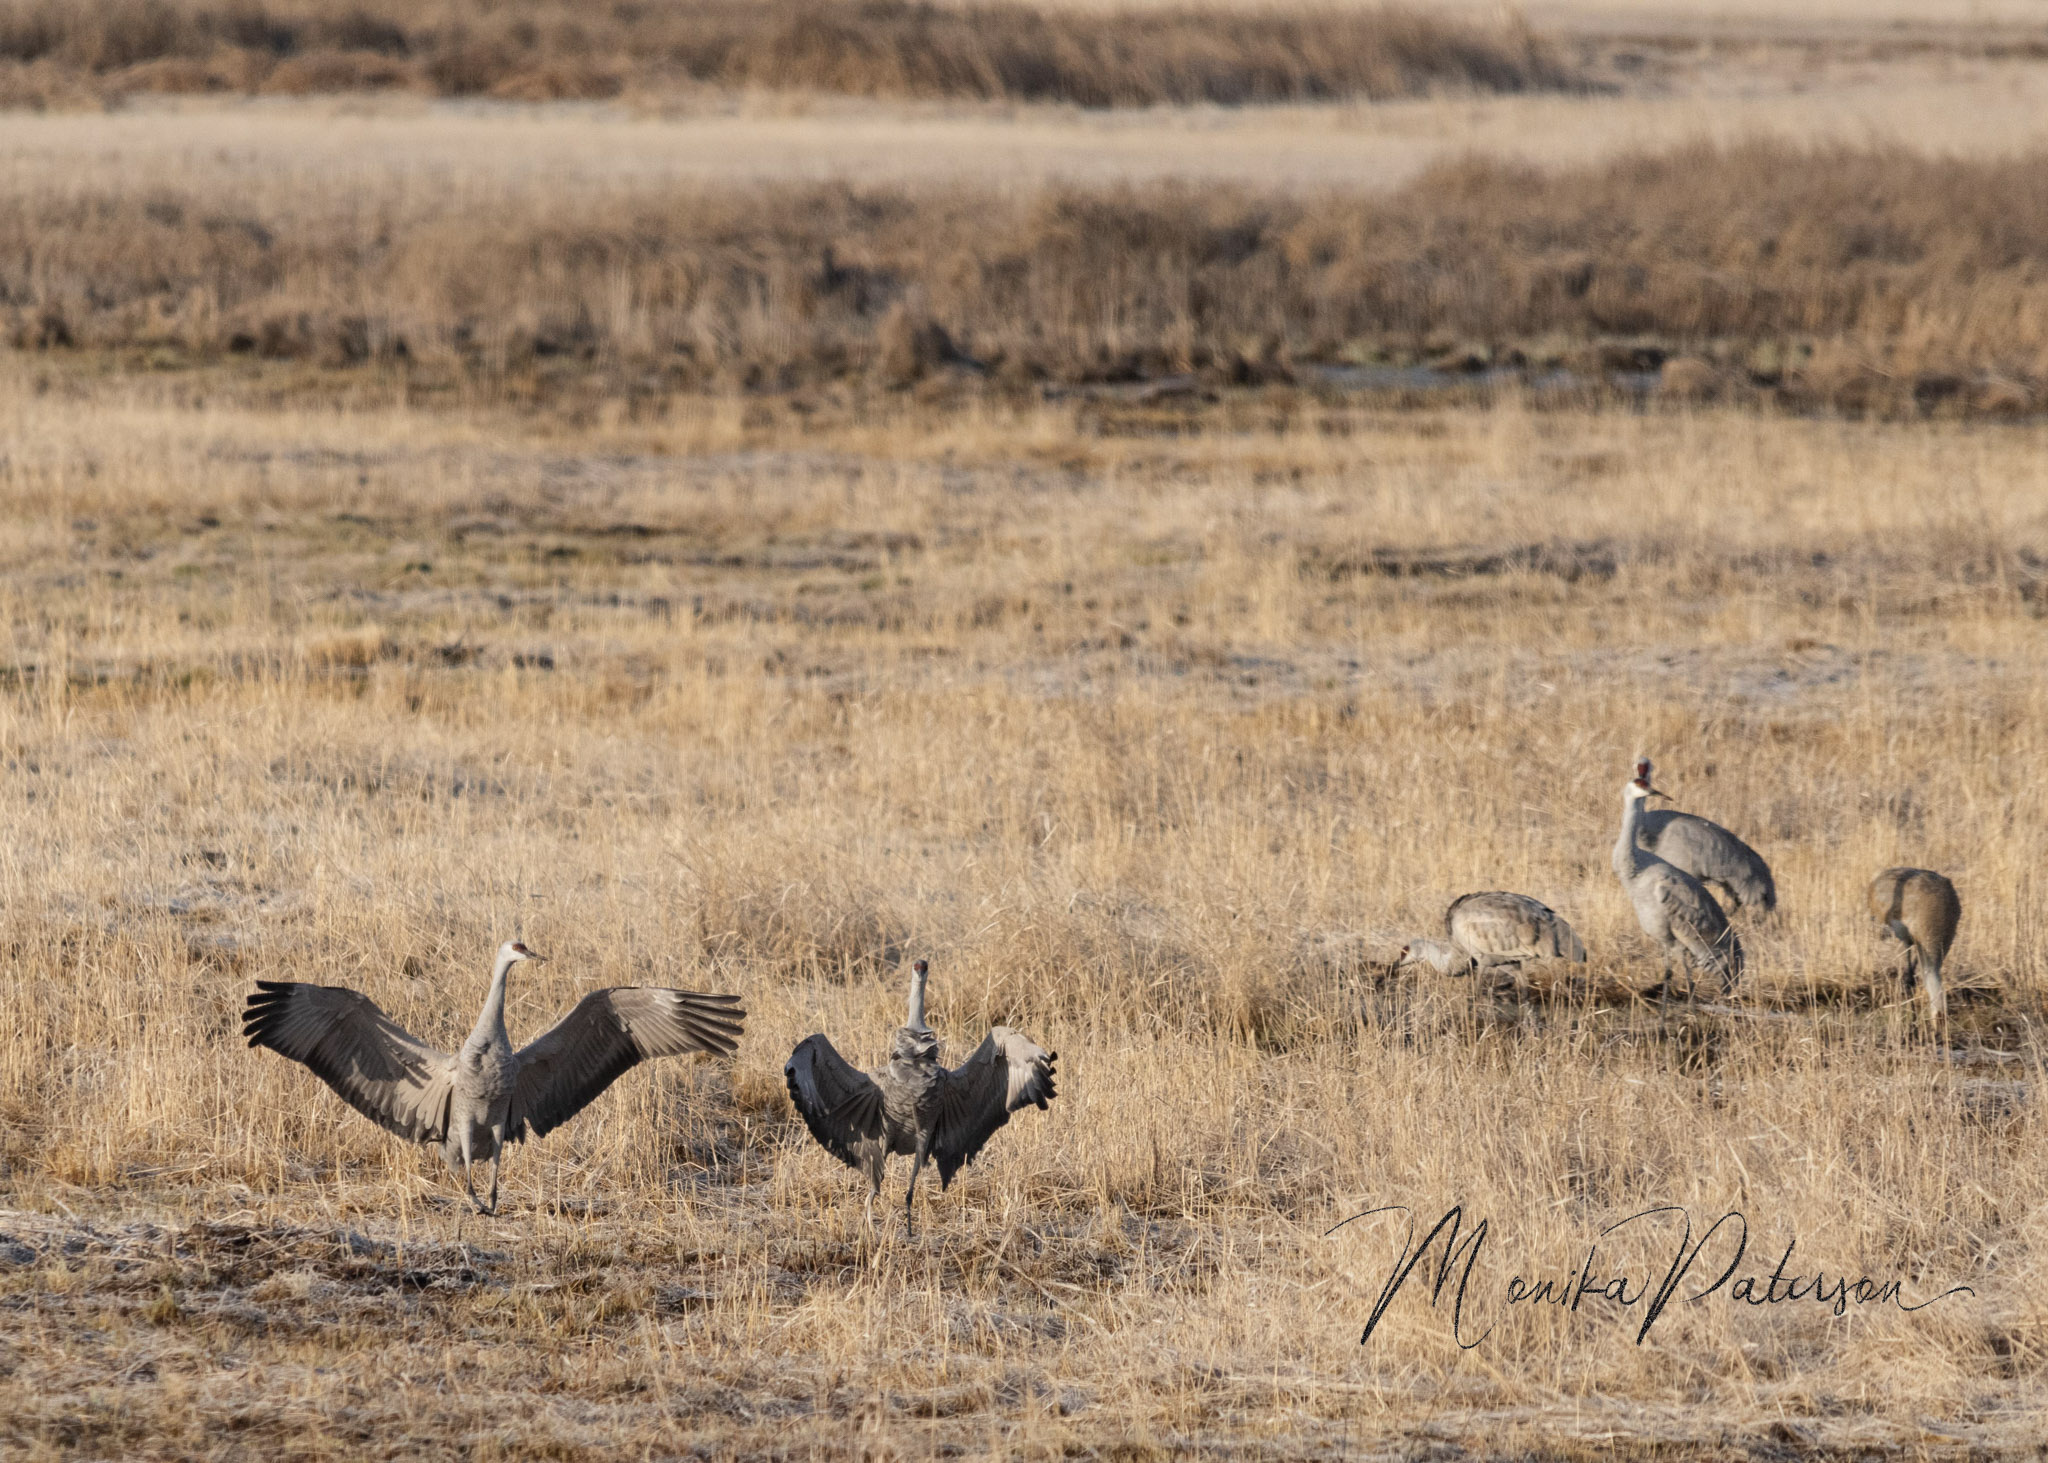 Monika Paterson_MHP5420 cranes landed edit sm wm- Small